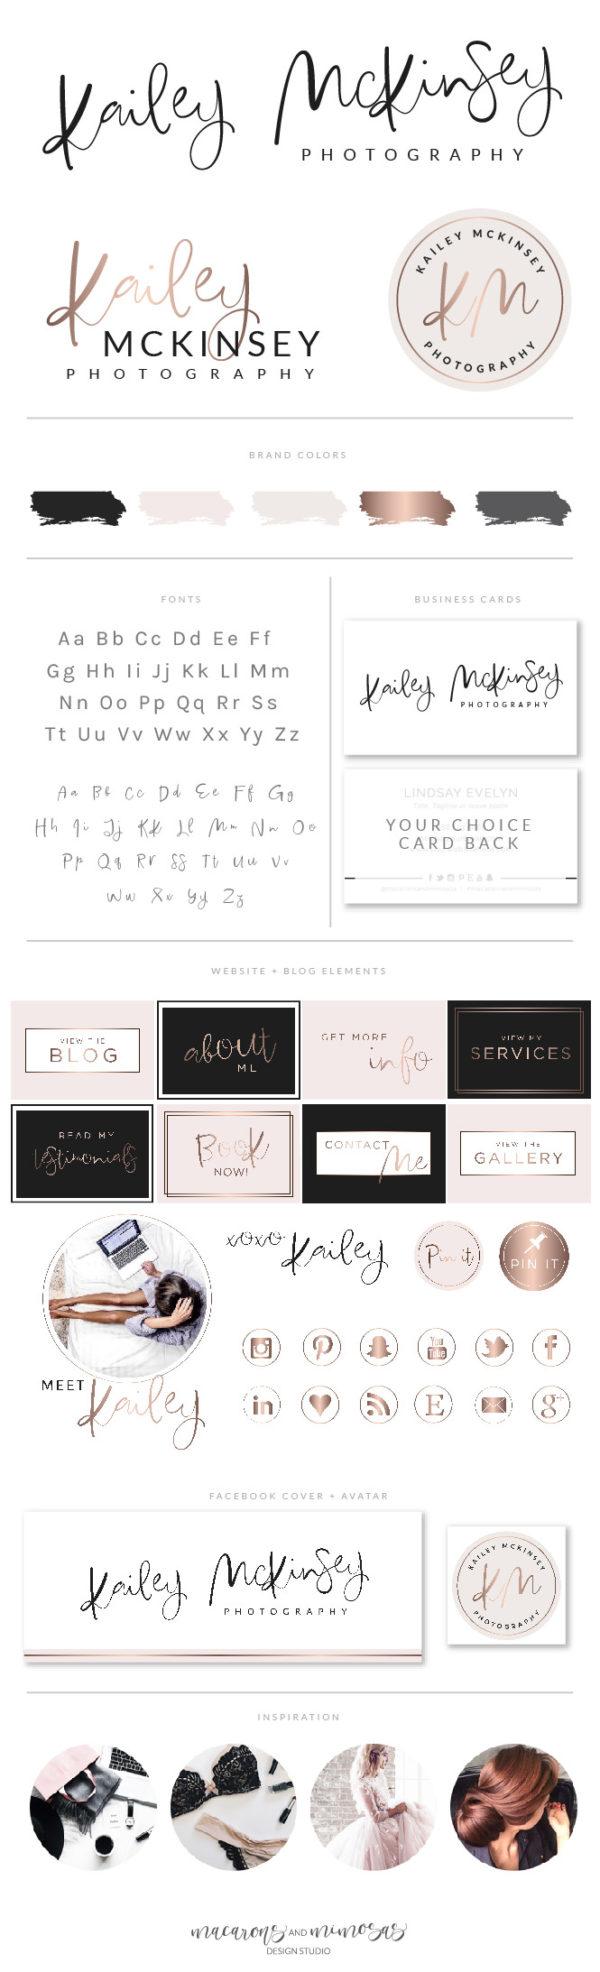 modern calligraphy logo branding package, branding board design, Modern script handwritten logo design, rose gold logo design, photography premade logo design, photographer branding package